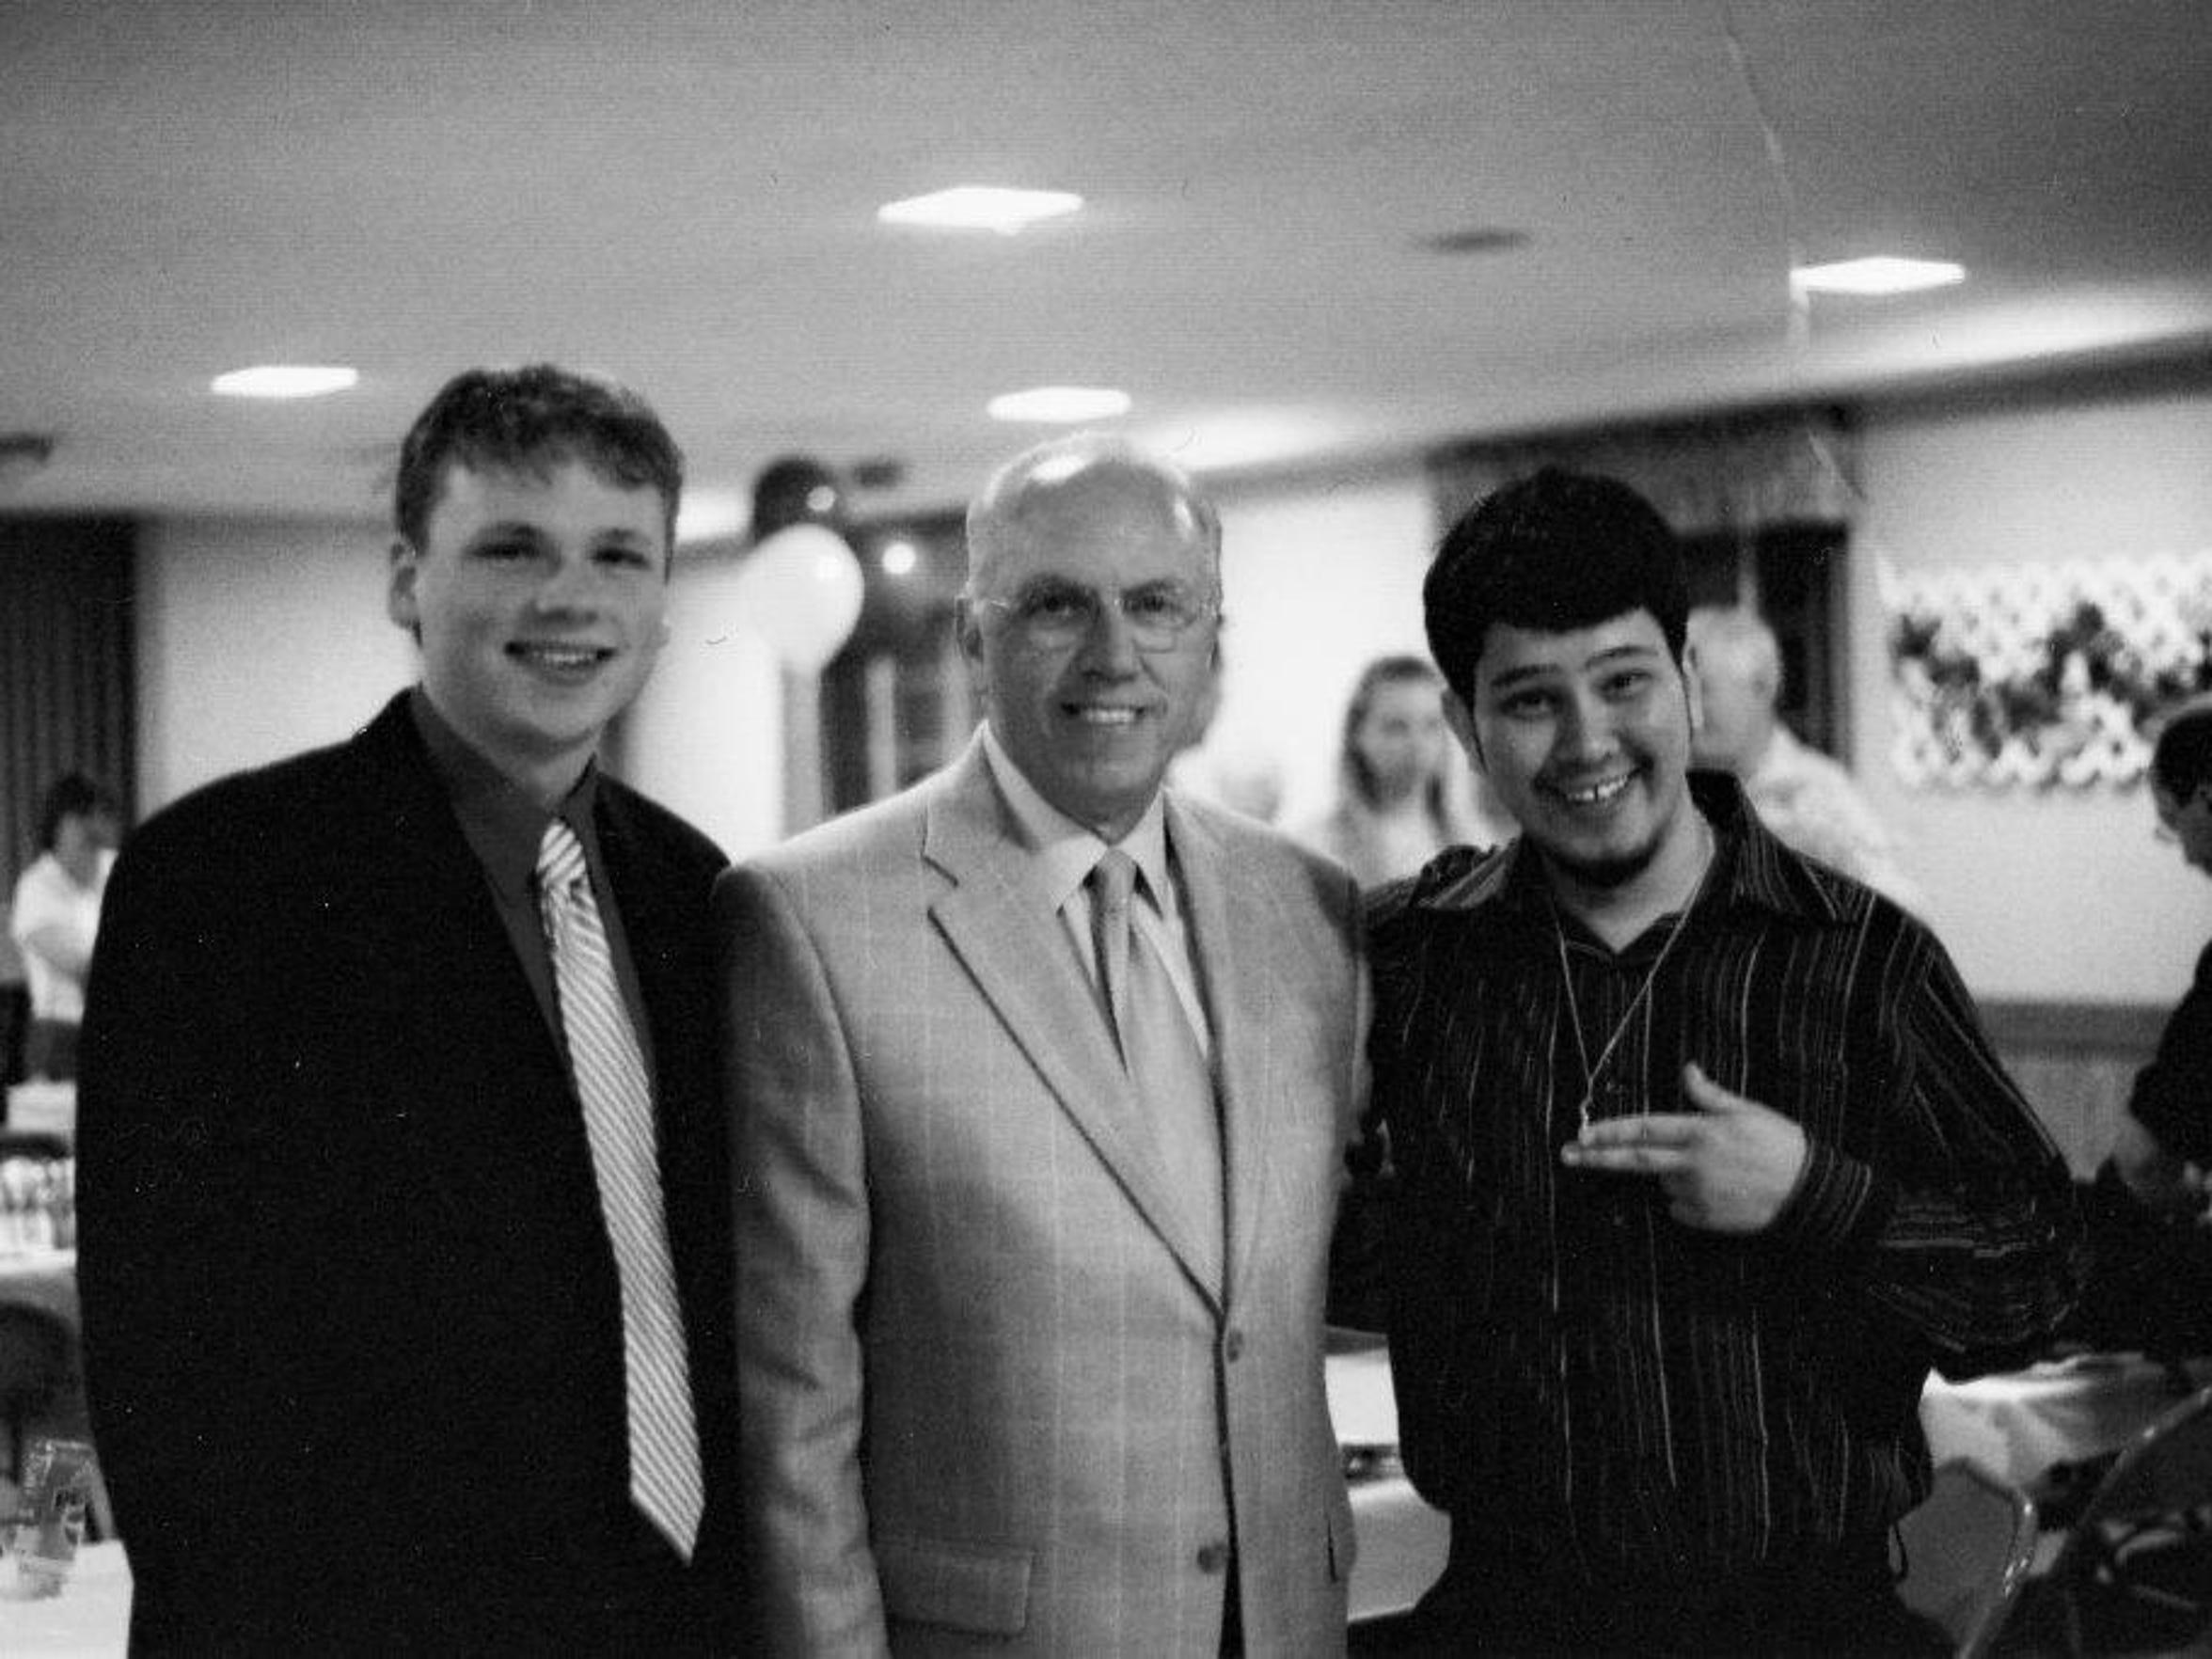 A classmate, Rod Bushey and 2006 Howell High School